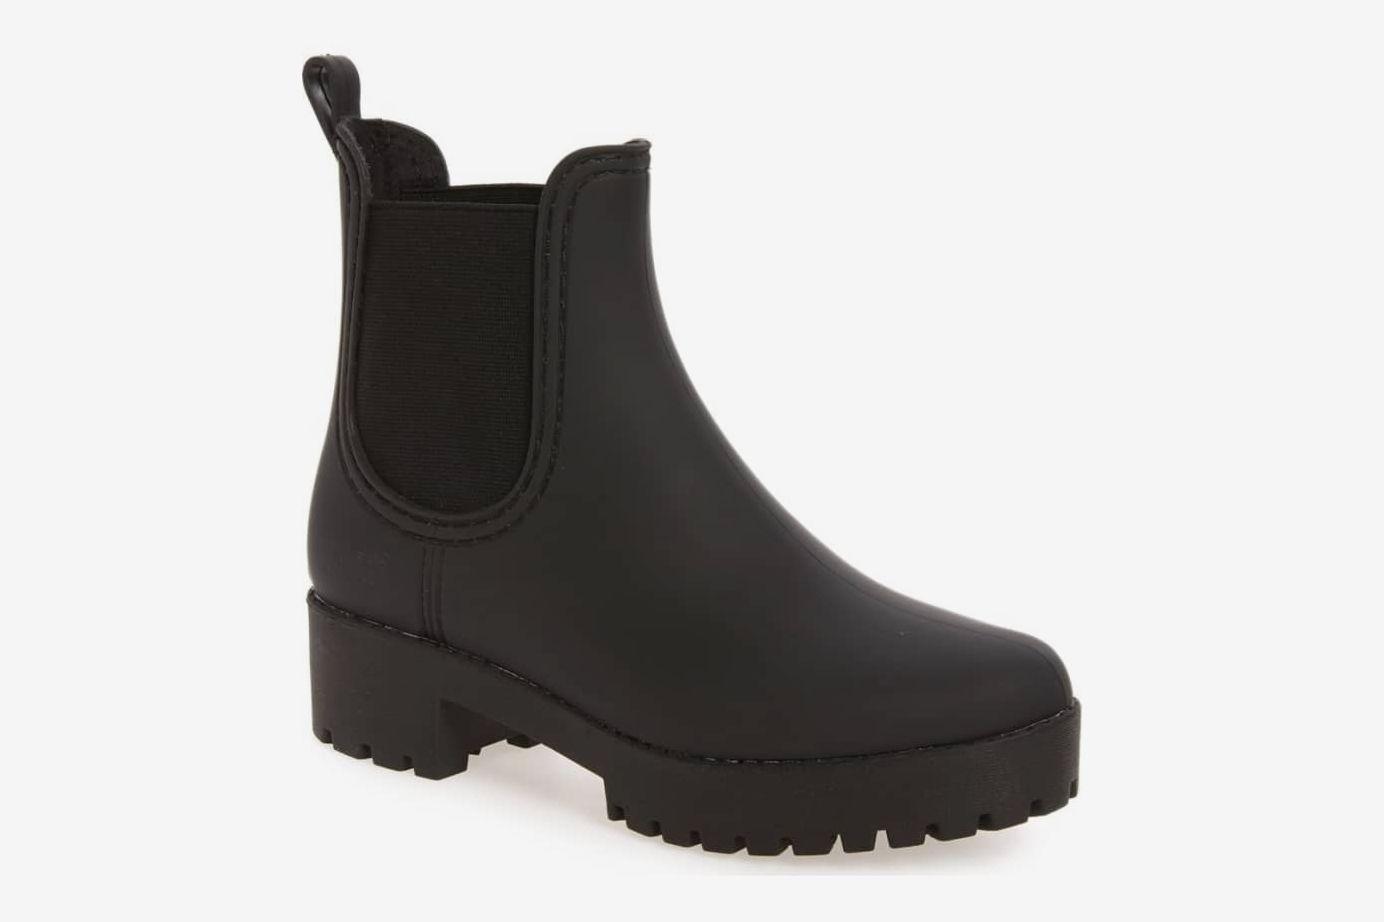 eb04972ae Jeffrey Campbell Cloudy Waterproof Chelsea Rain Boot